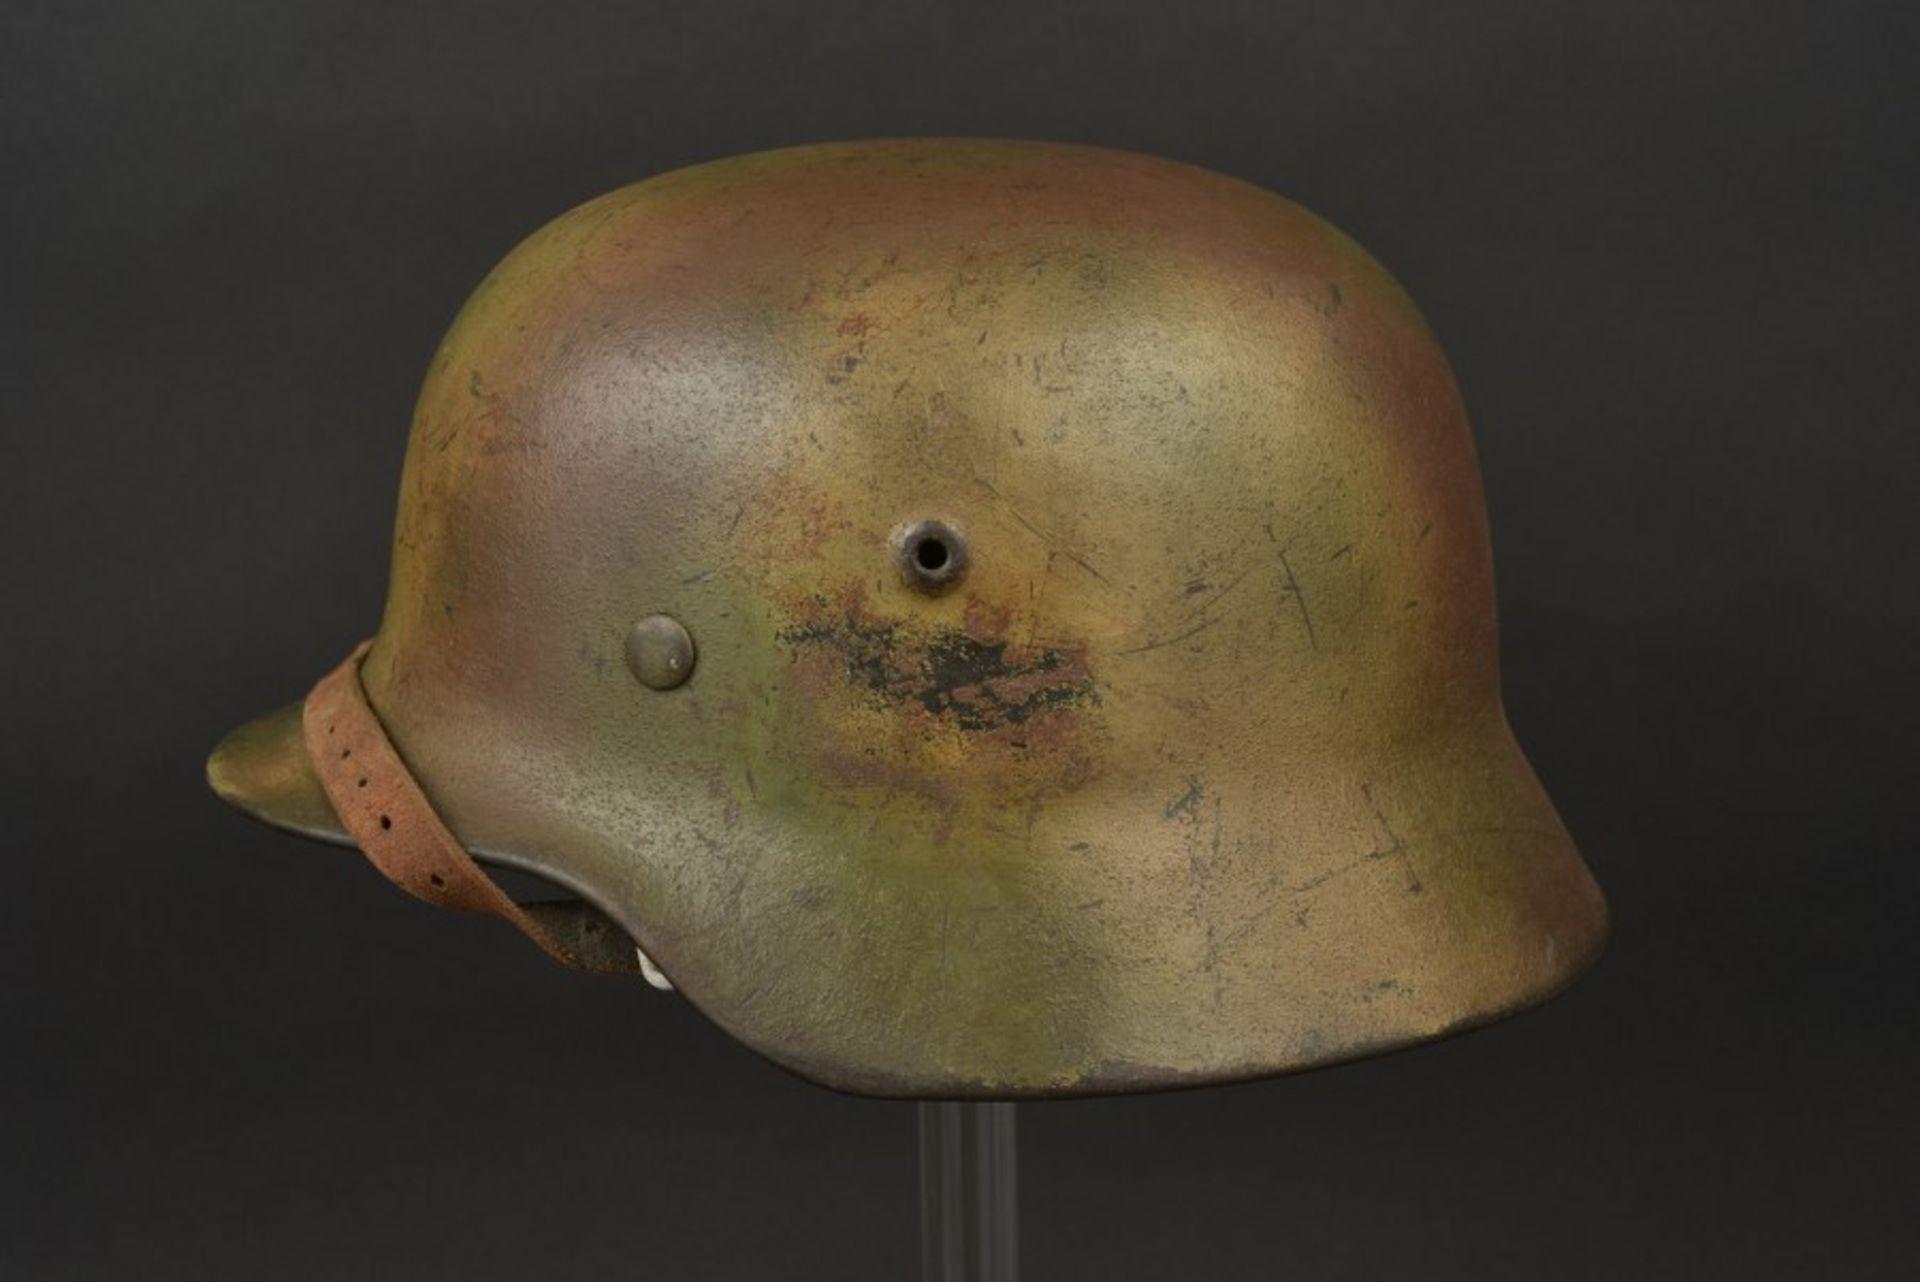 Casque camouflé de l'Obergefreiter Binnewies. Camouflaged helmet belonging to Obergefreiter - Bild 2 aus 4